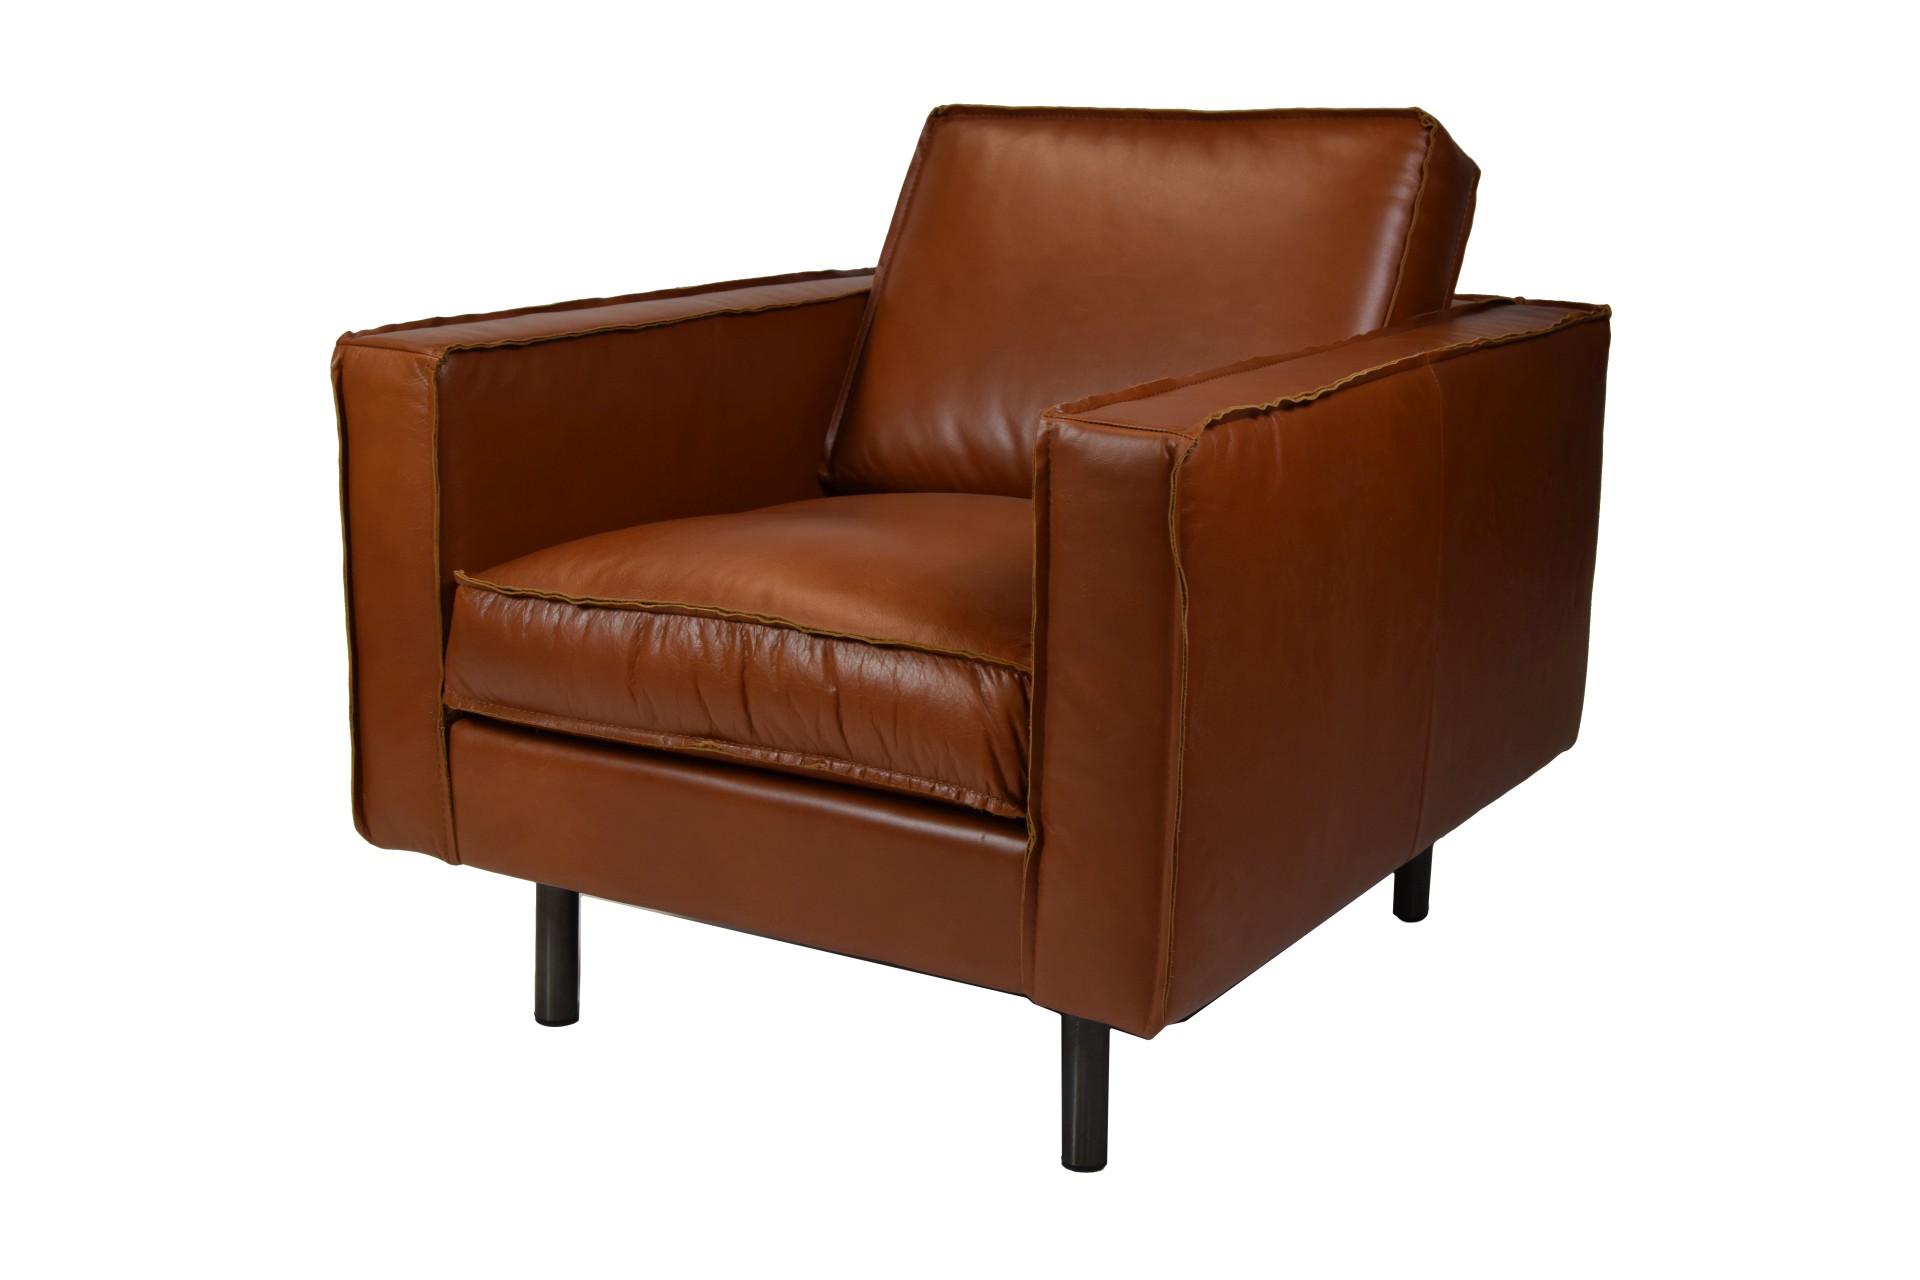 ledersessel gaucho vintage anilin rodeo cognac 1 sitzer. Black Bedroom Furniture Sets. Home Design Ideas